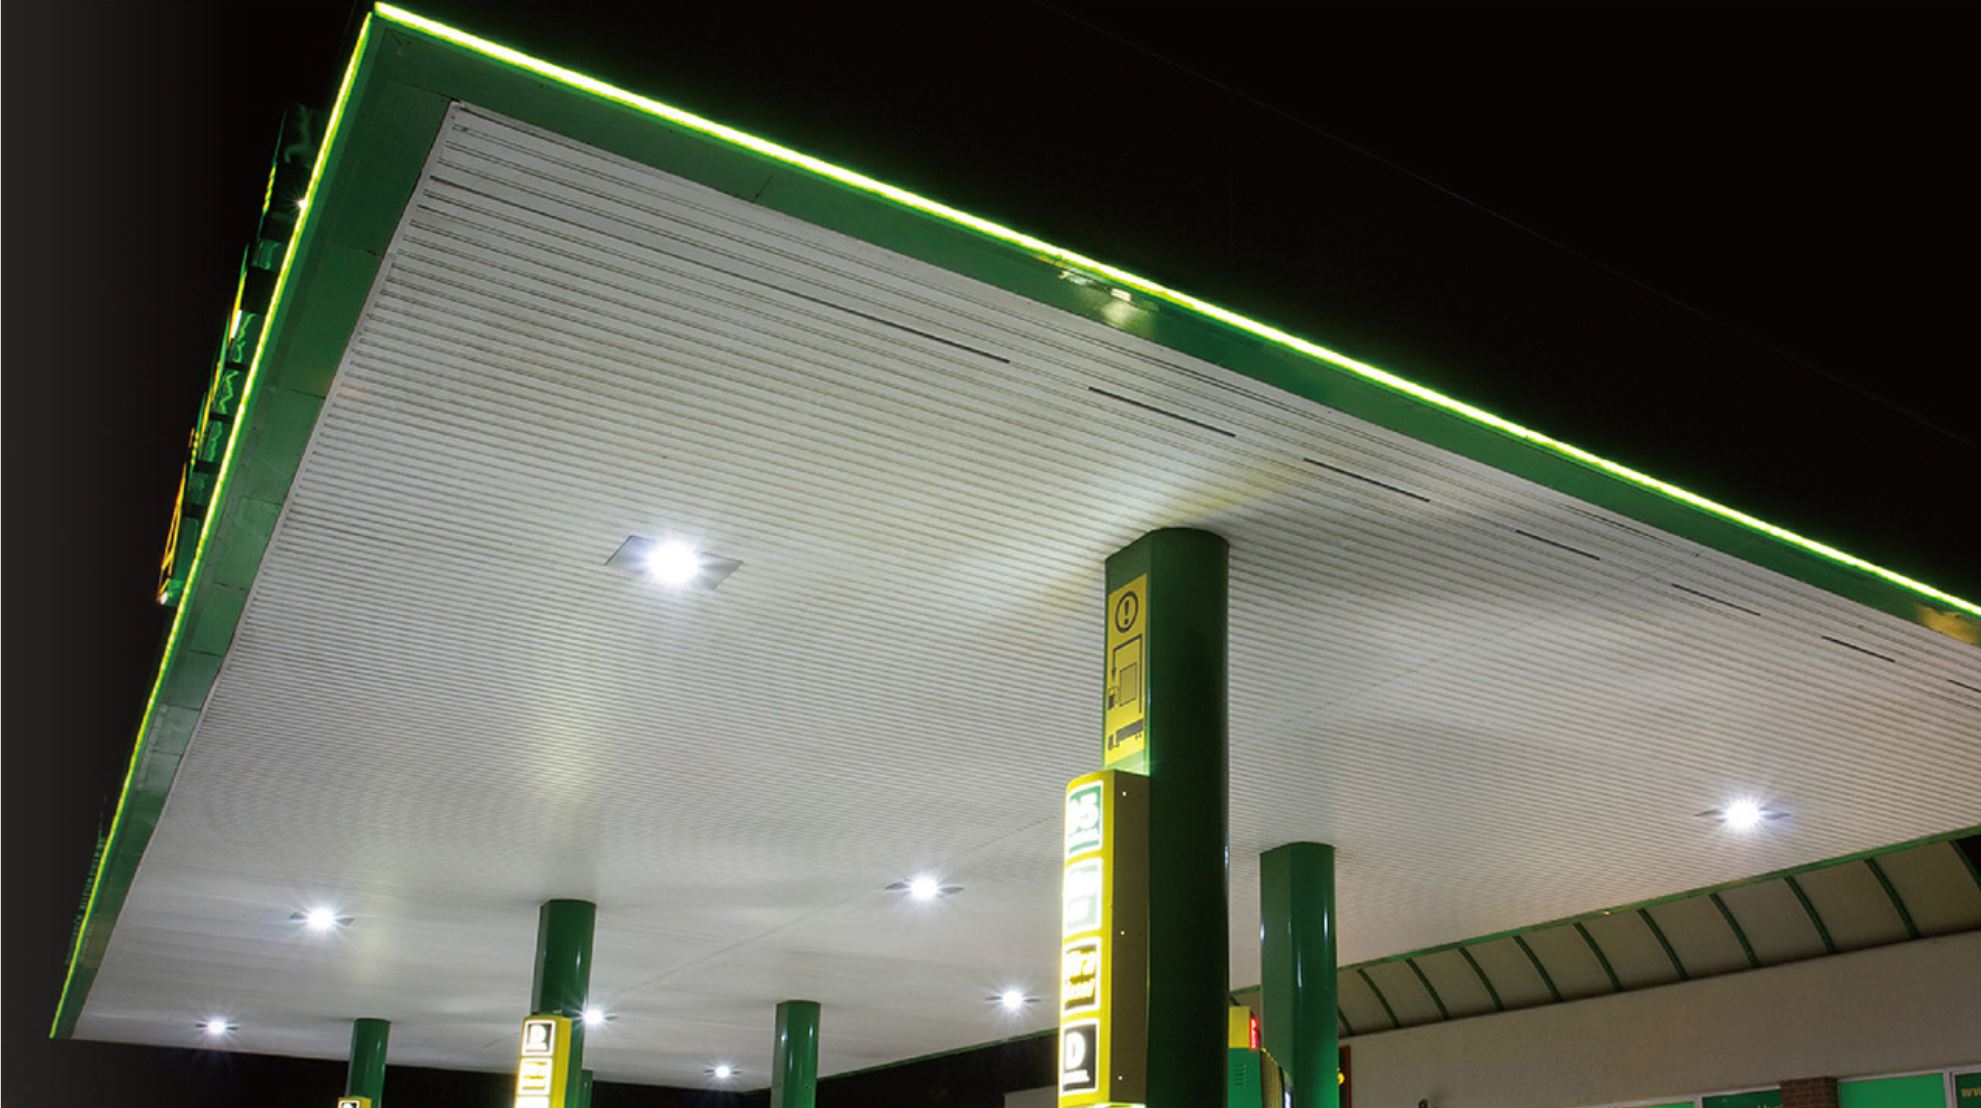 LED Tankstellenleuchte Petrol Tankstelle LED Beleuchtung